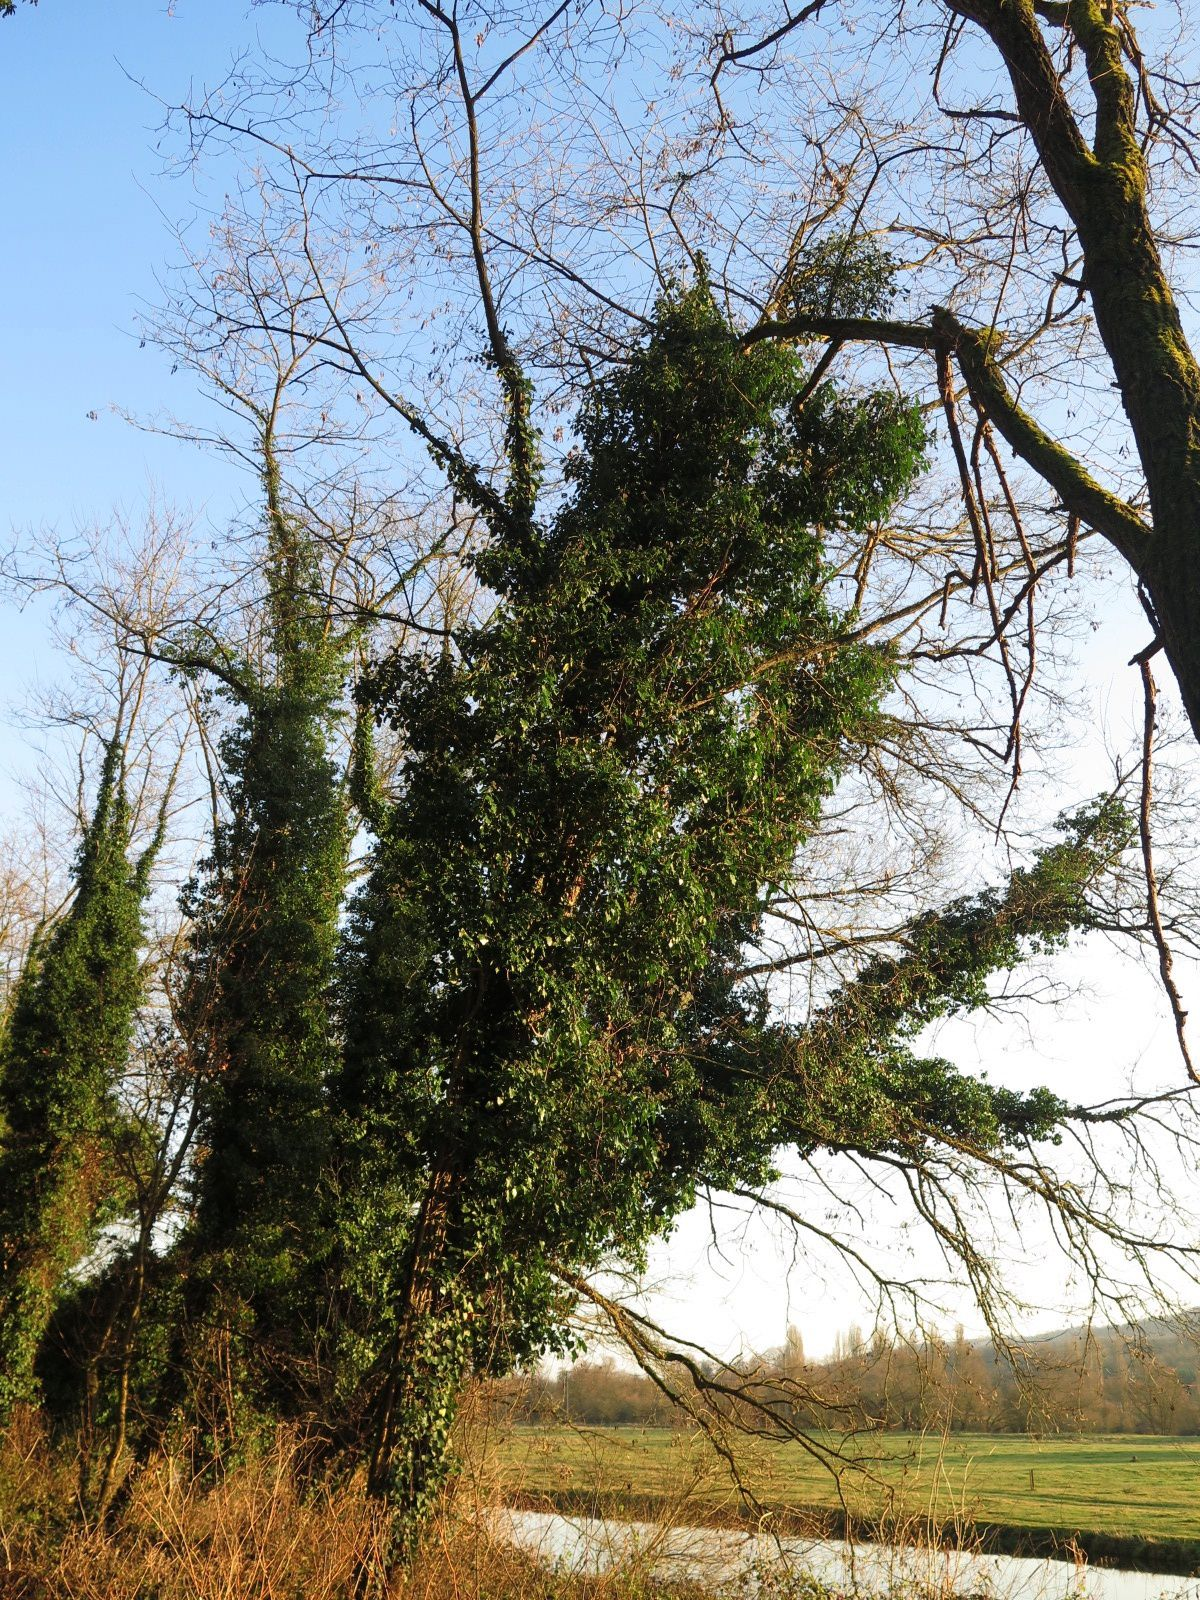 Des arbres verts, même en hiver